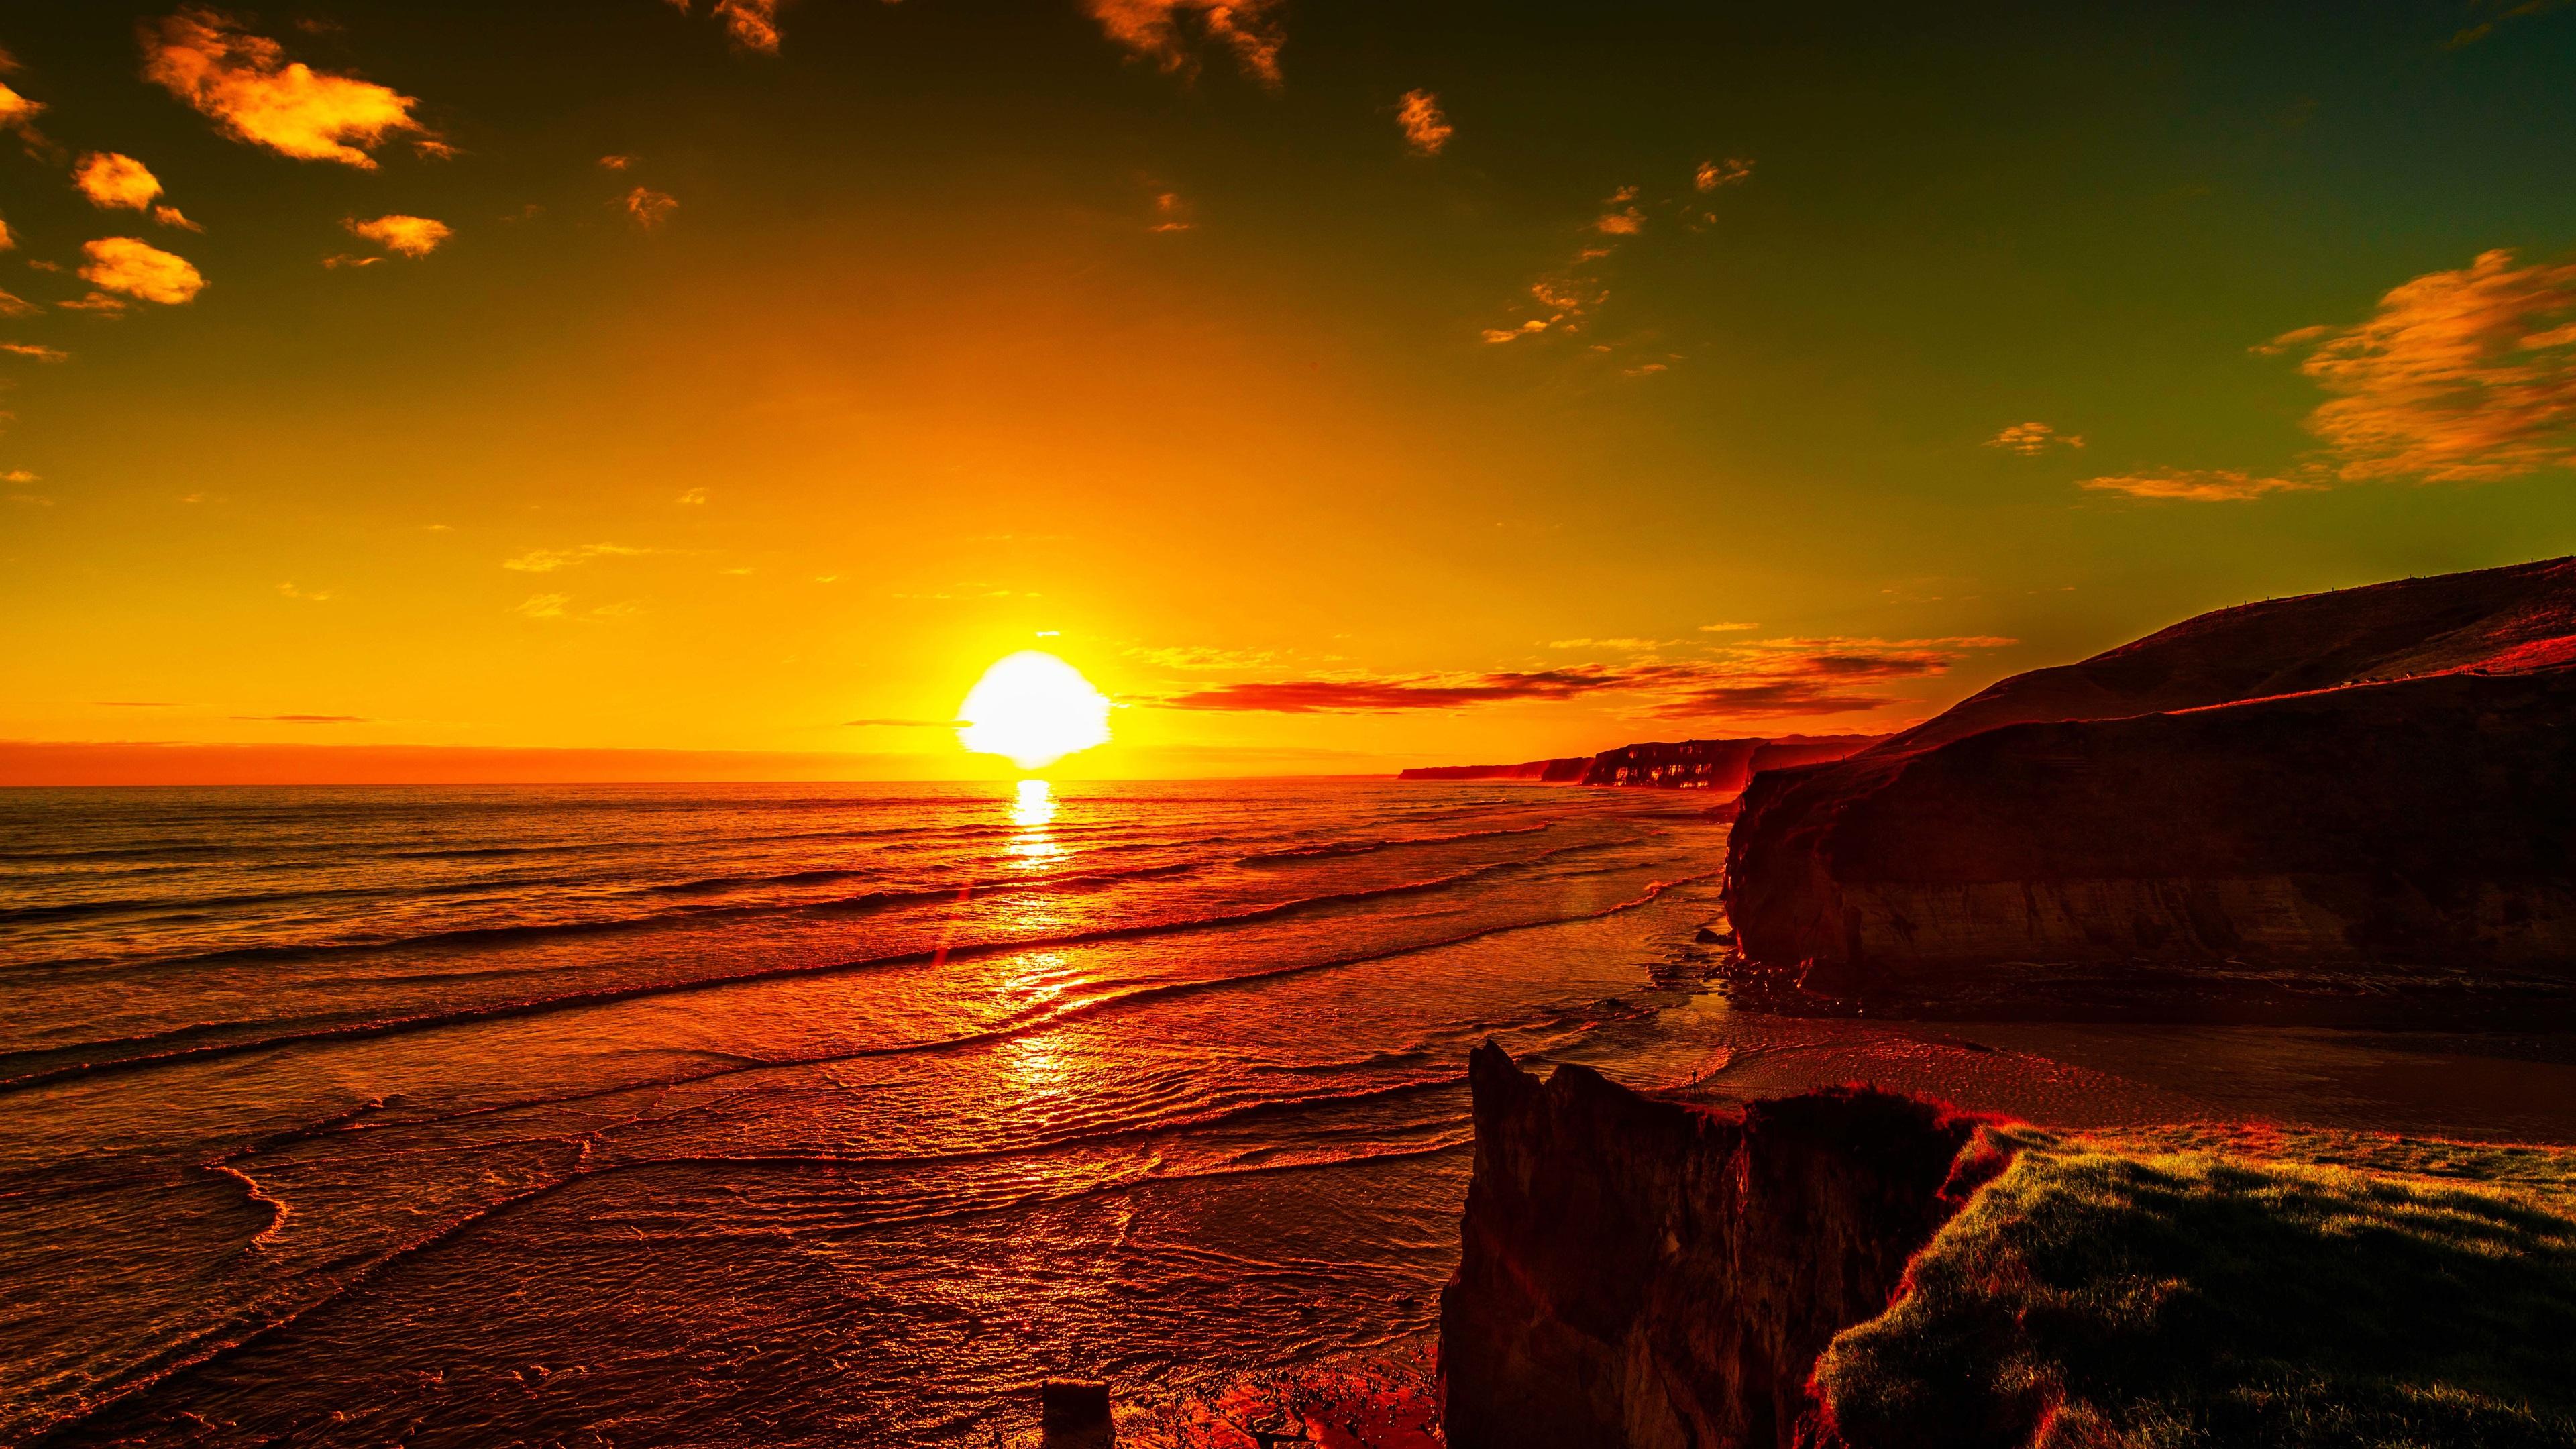 Wallpaper Sea Sunset Red Sky Coast Dusk 3840x2160 Uhd 4k